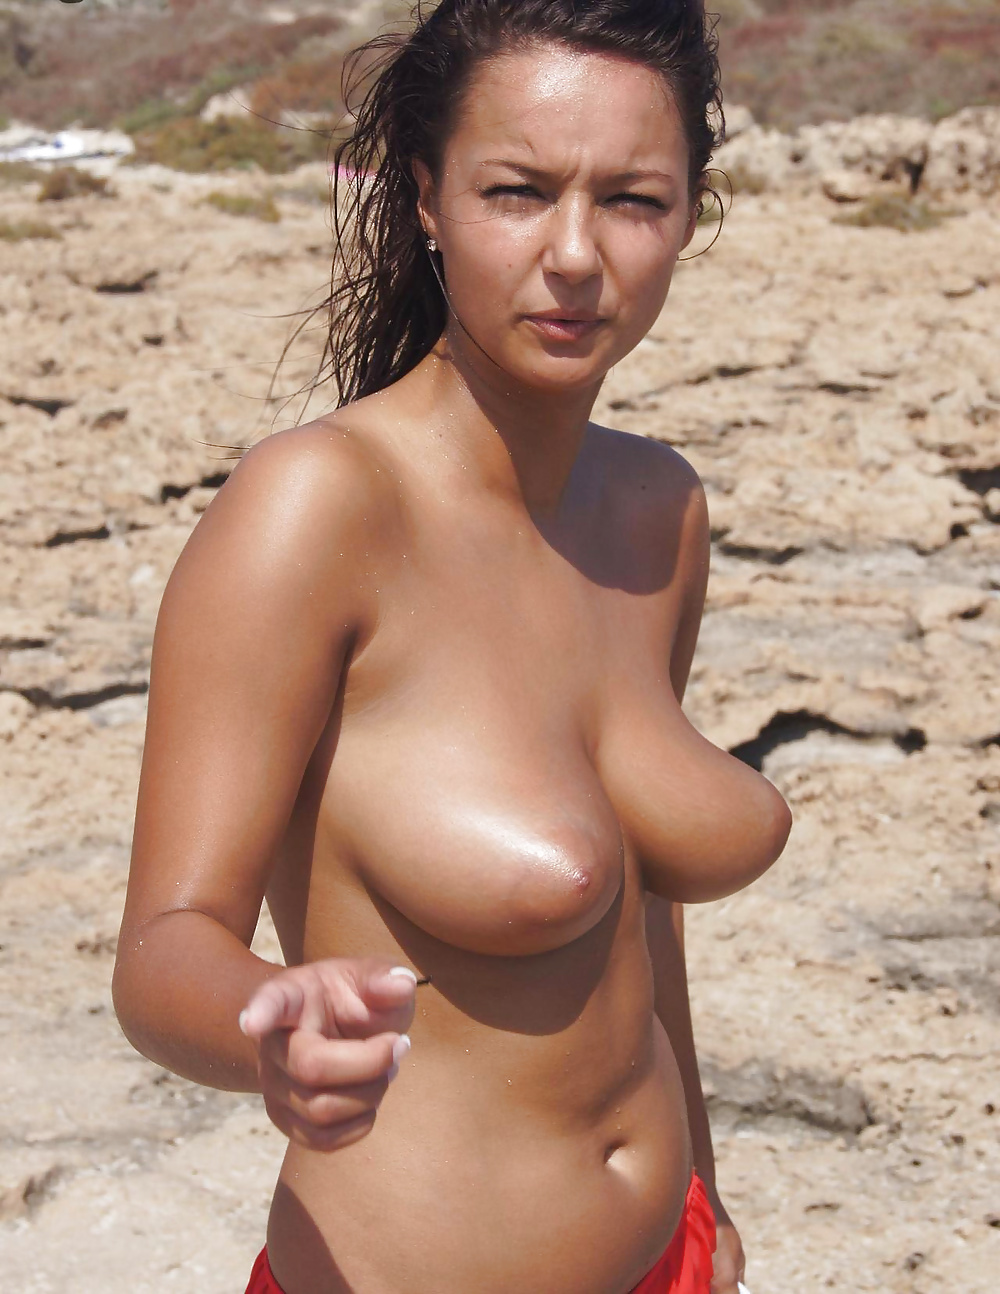 big-nipples-women-topless-naked-streetfights